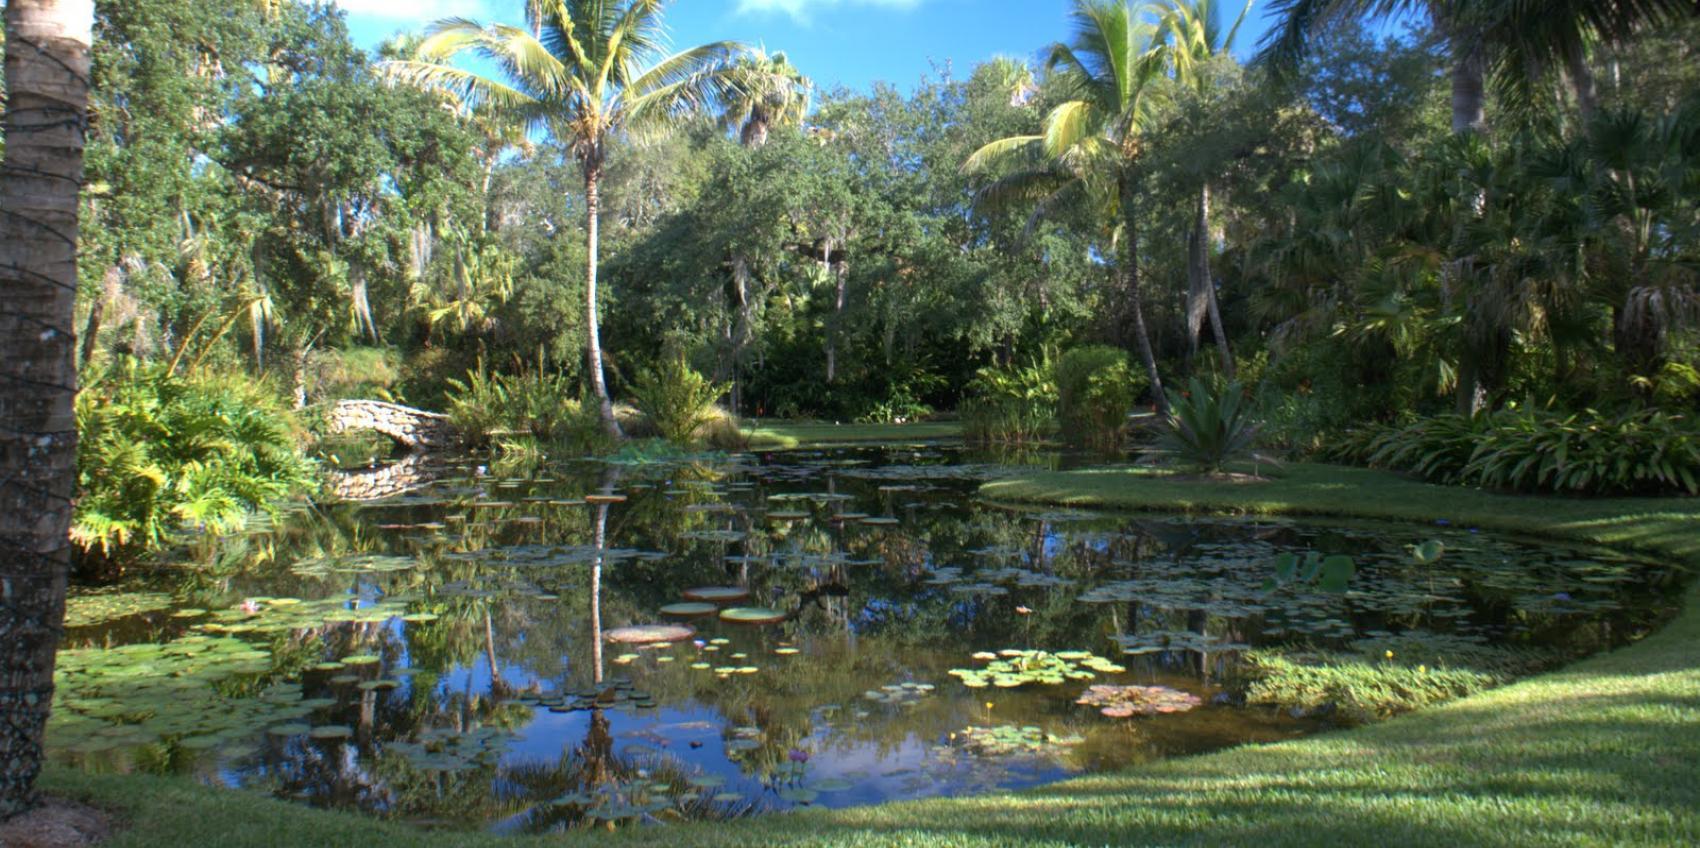 Mckee Botanical Garden American Public Gardens Association